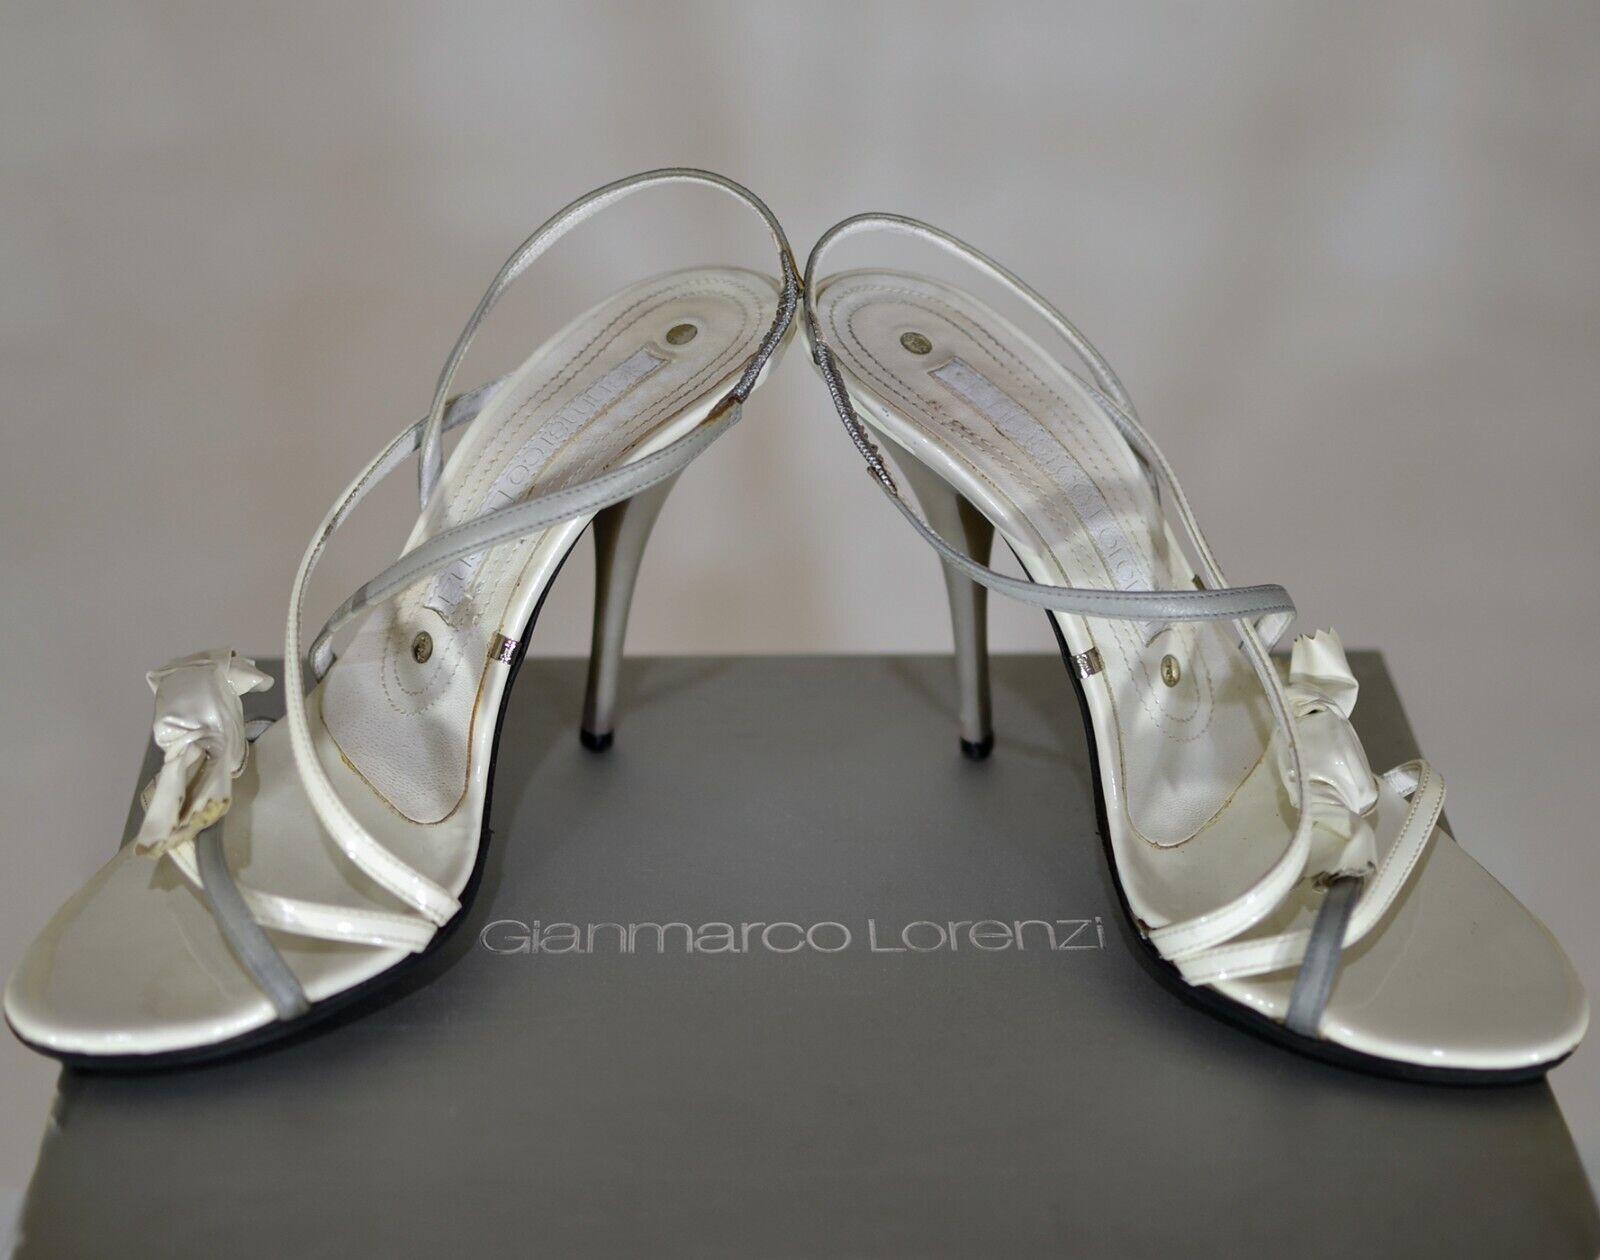 Gianmarco Lorenzi sandalias, Cocheamelo, Hell Color blancoo 37 - 7.